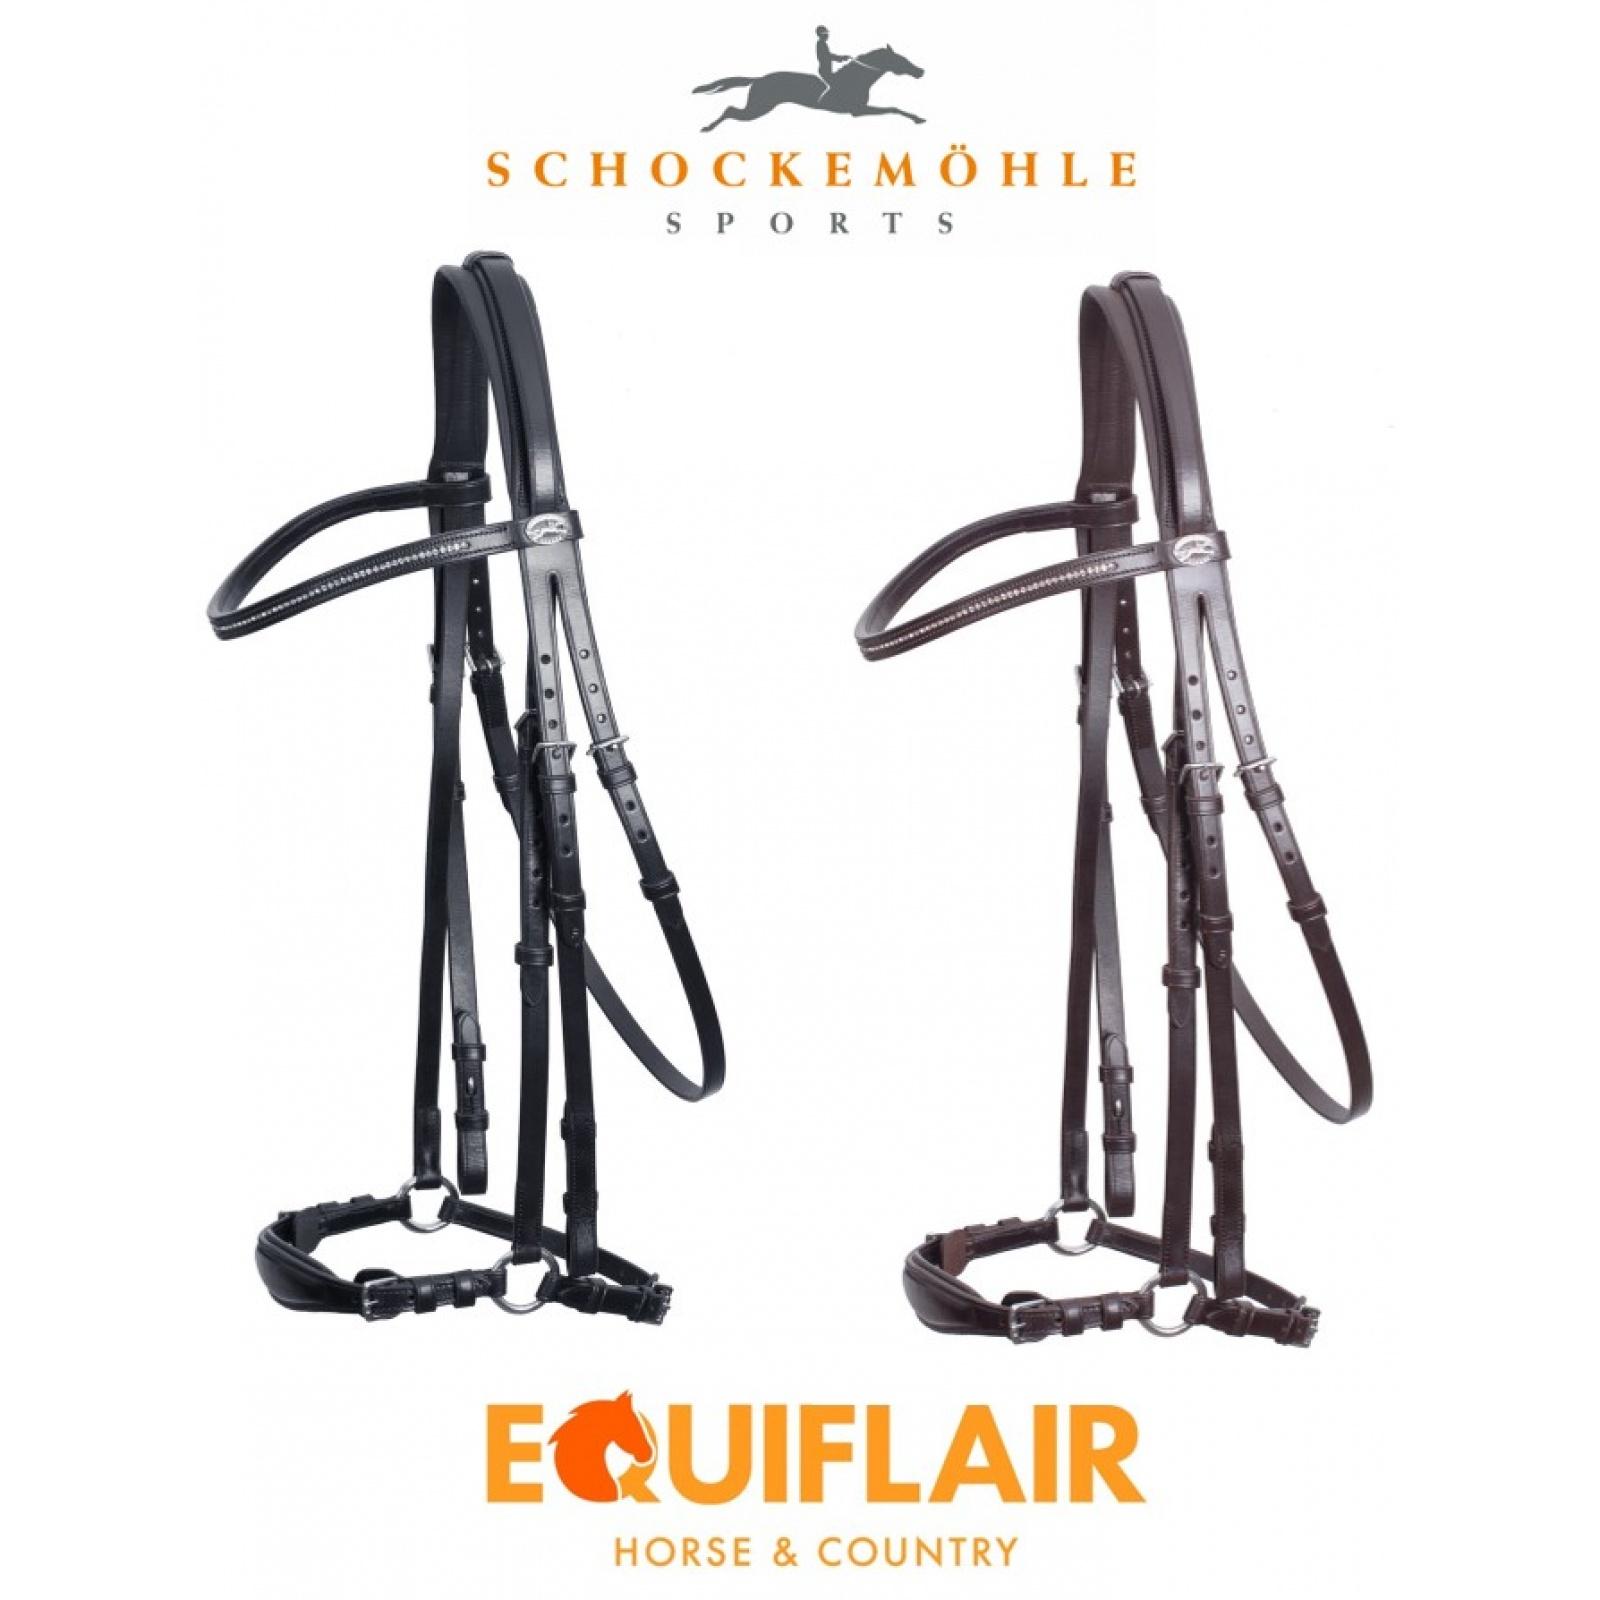 Schockemohle-Copenhagen-Classic-Line-Drop-Noseband-Bridle miniature 7